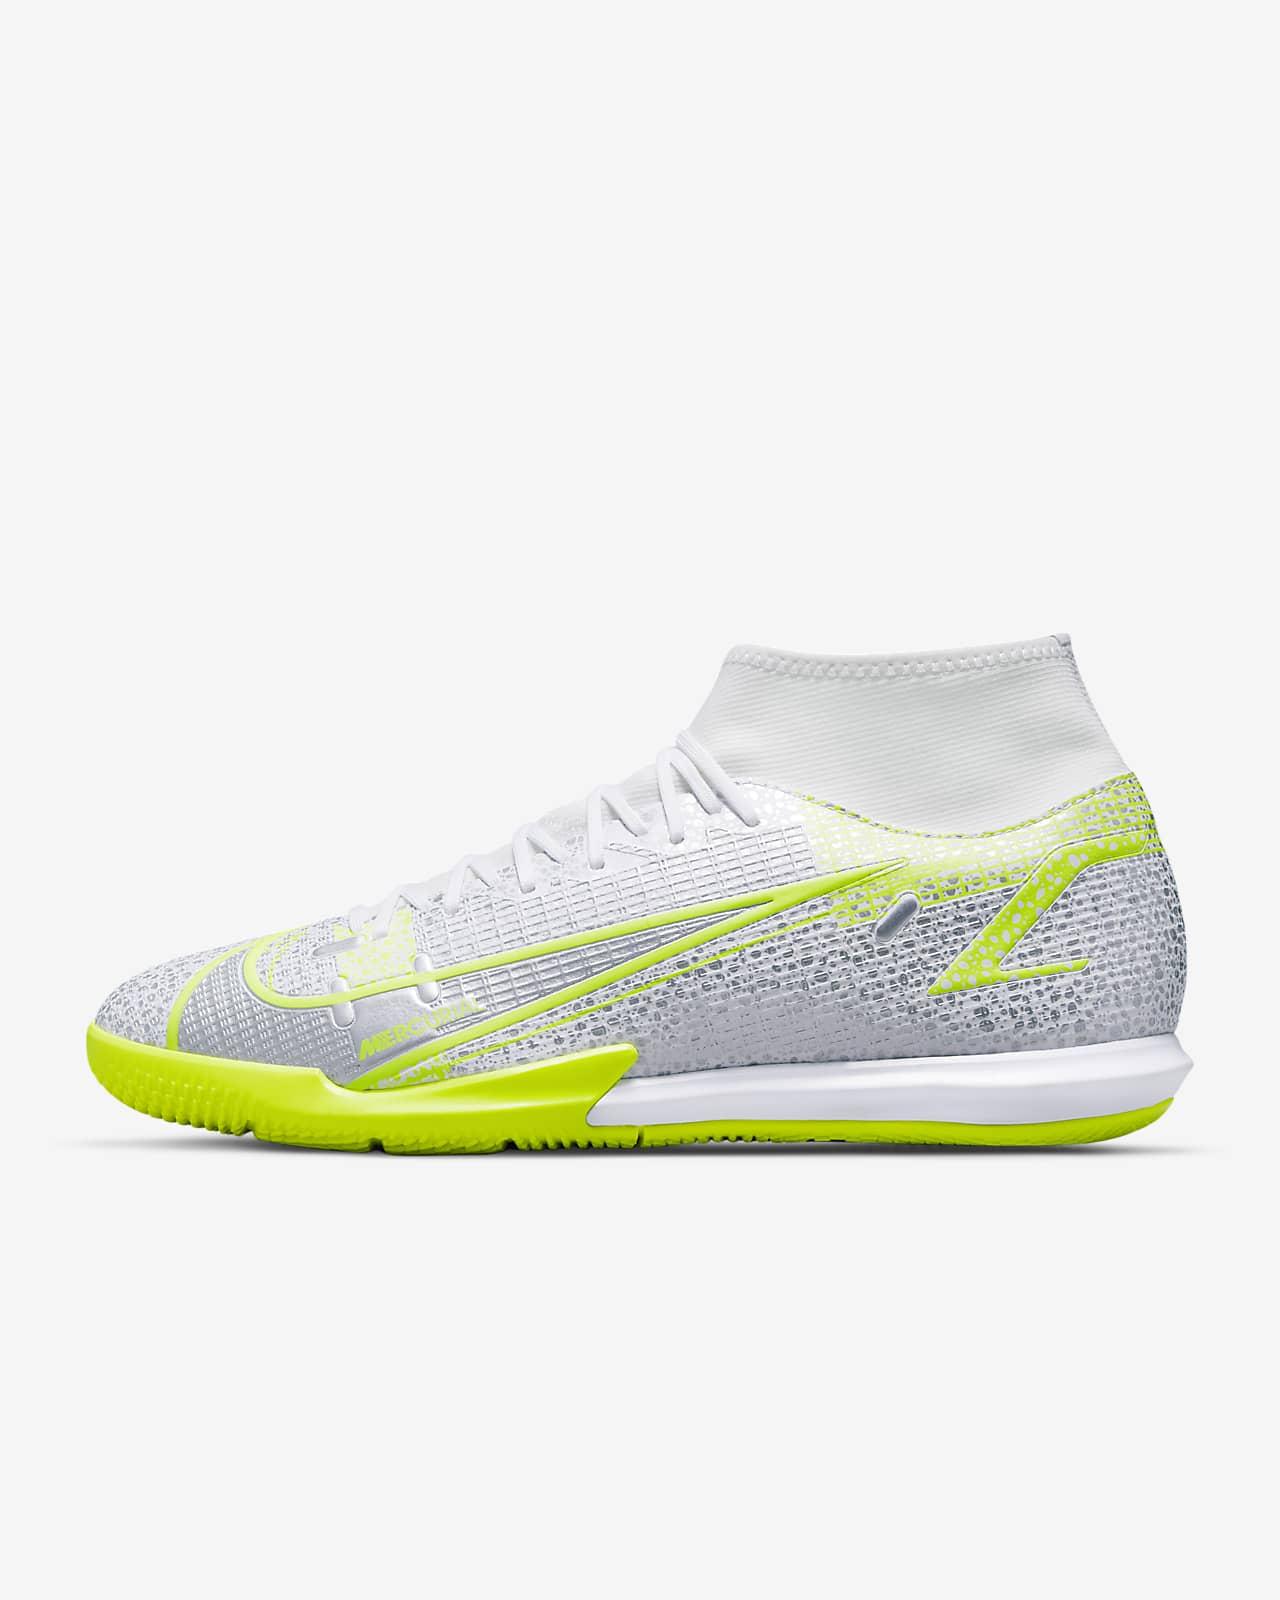 Nike Mercurial Superfly 8 Academy IC Indoor Court Football Shoe